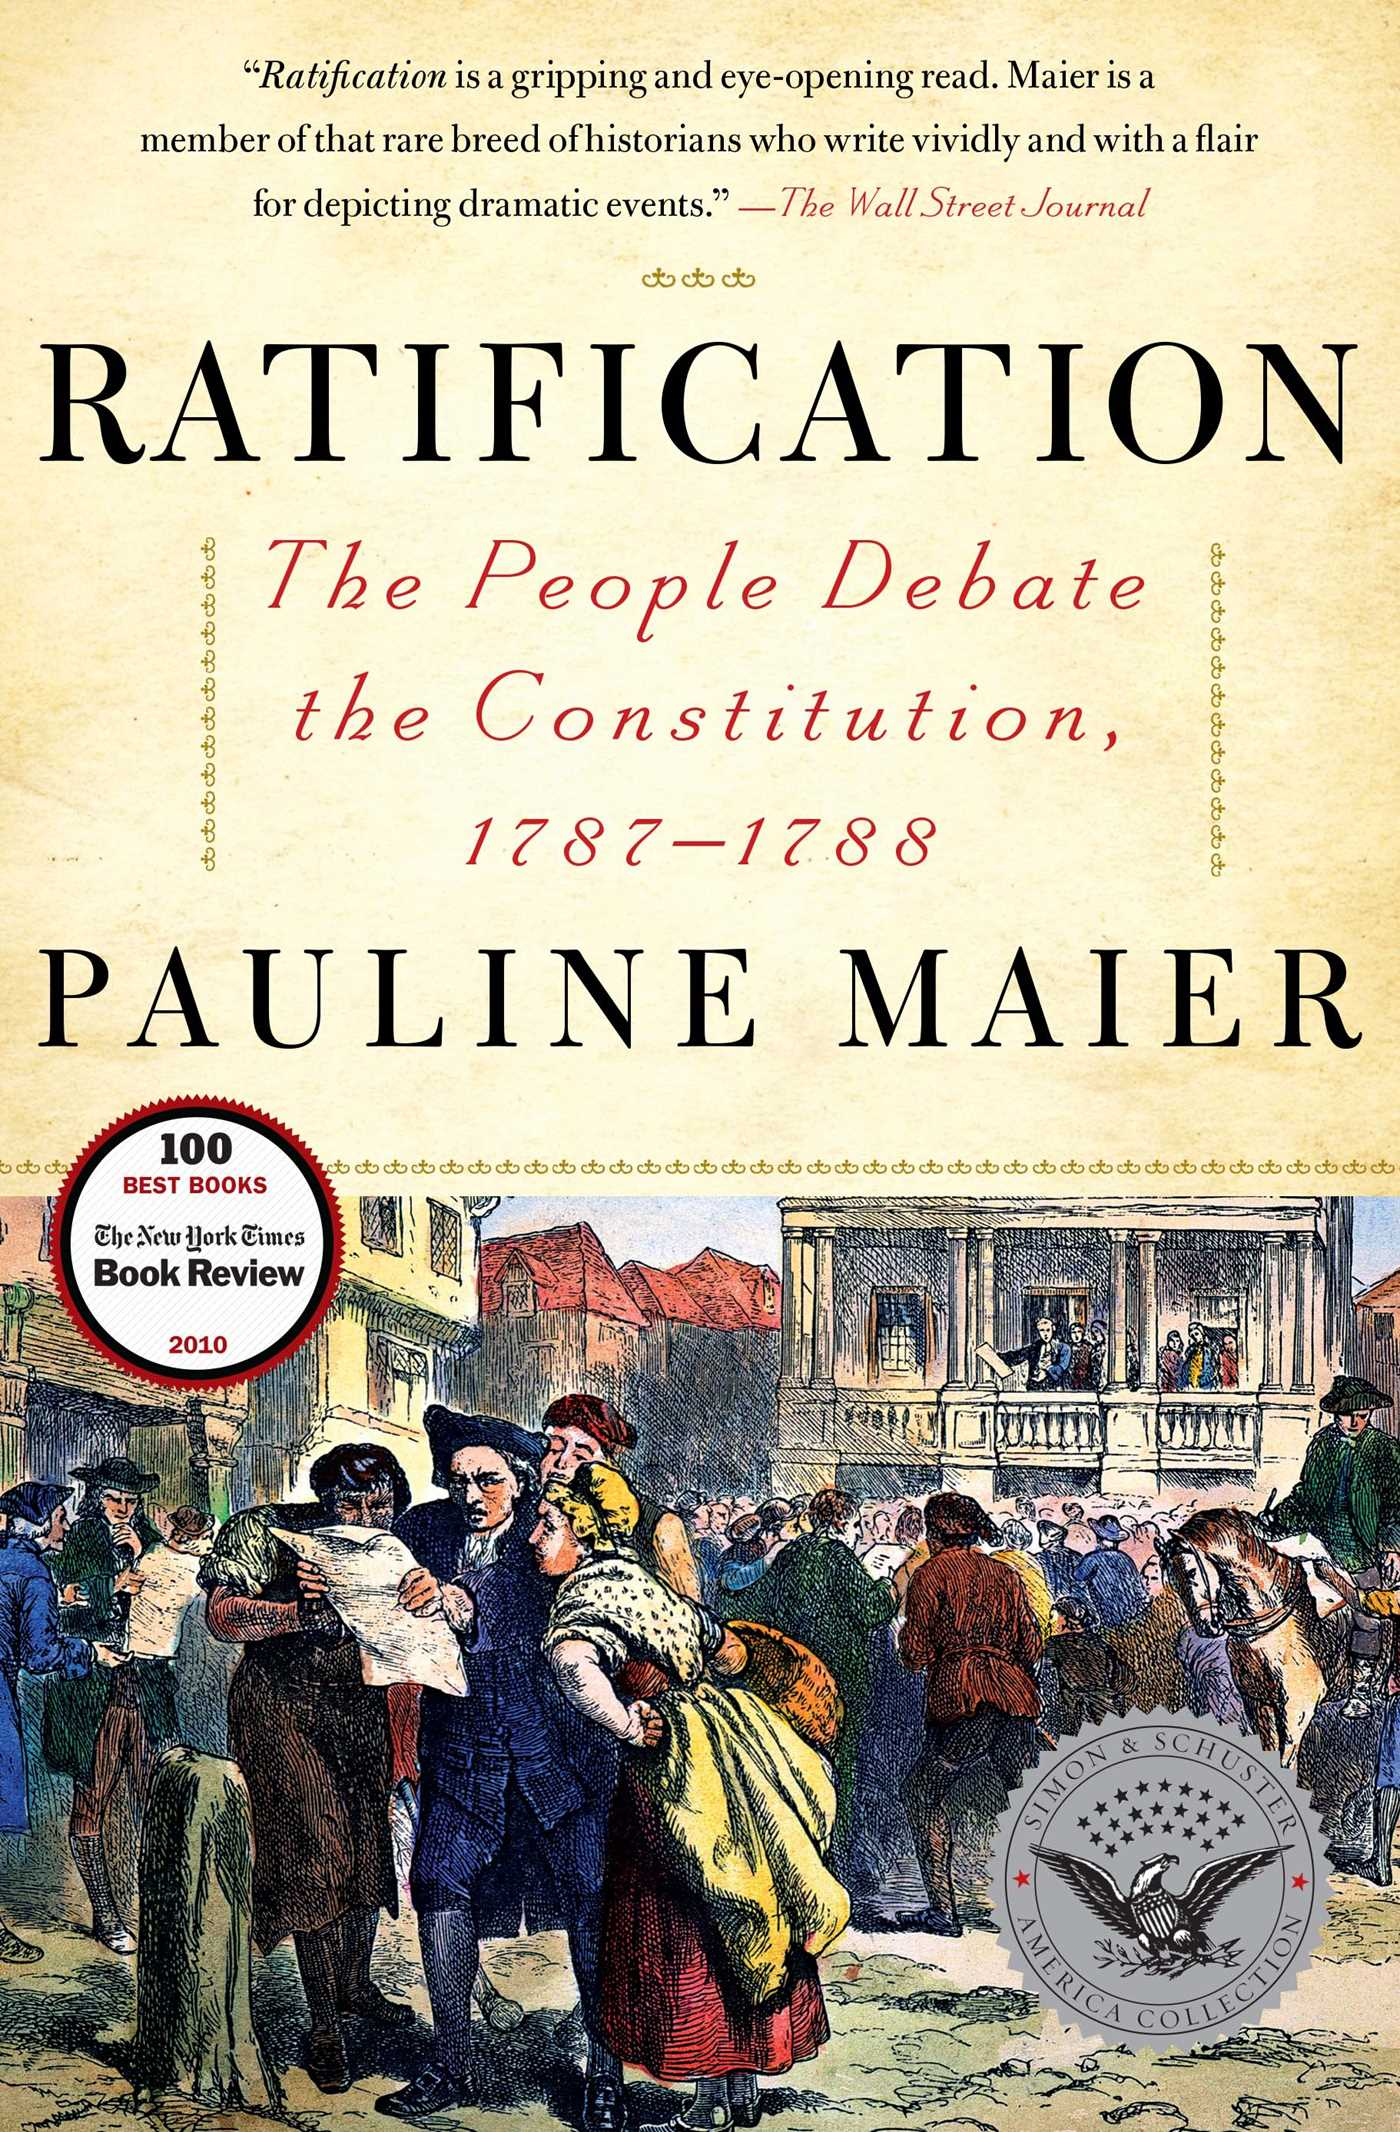 essays urging ratification during ny ratification debates